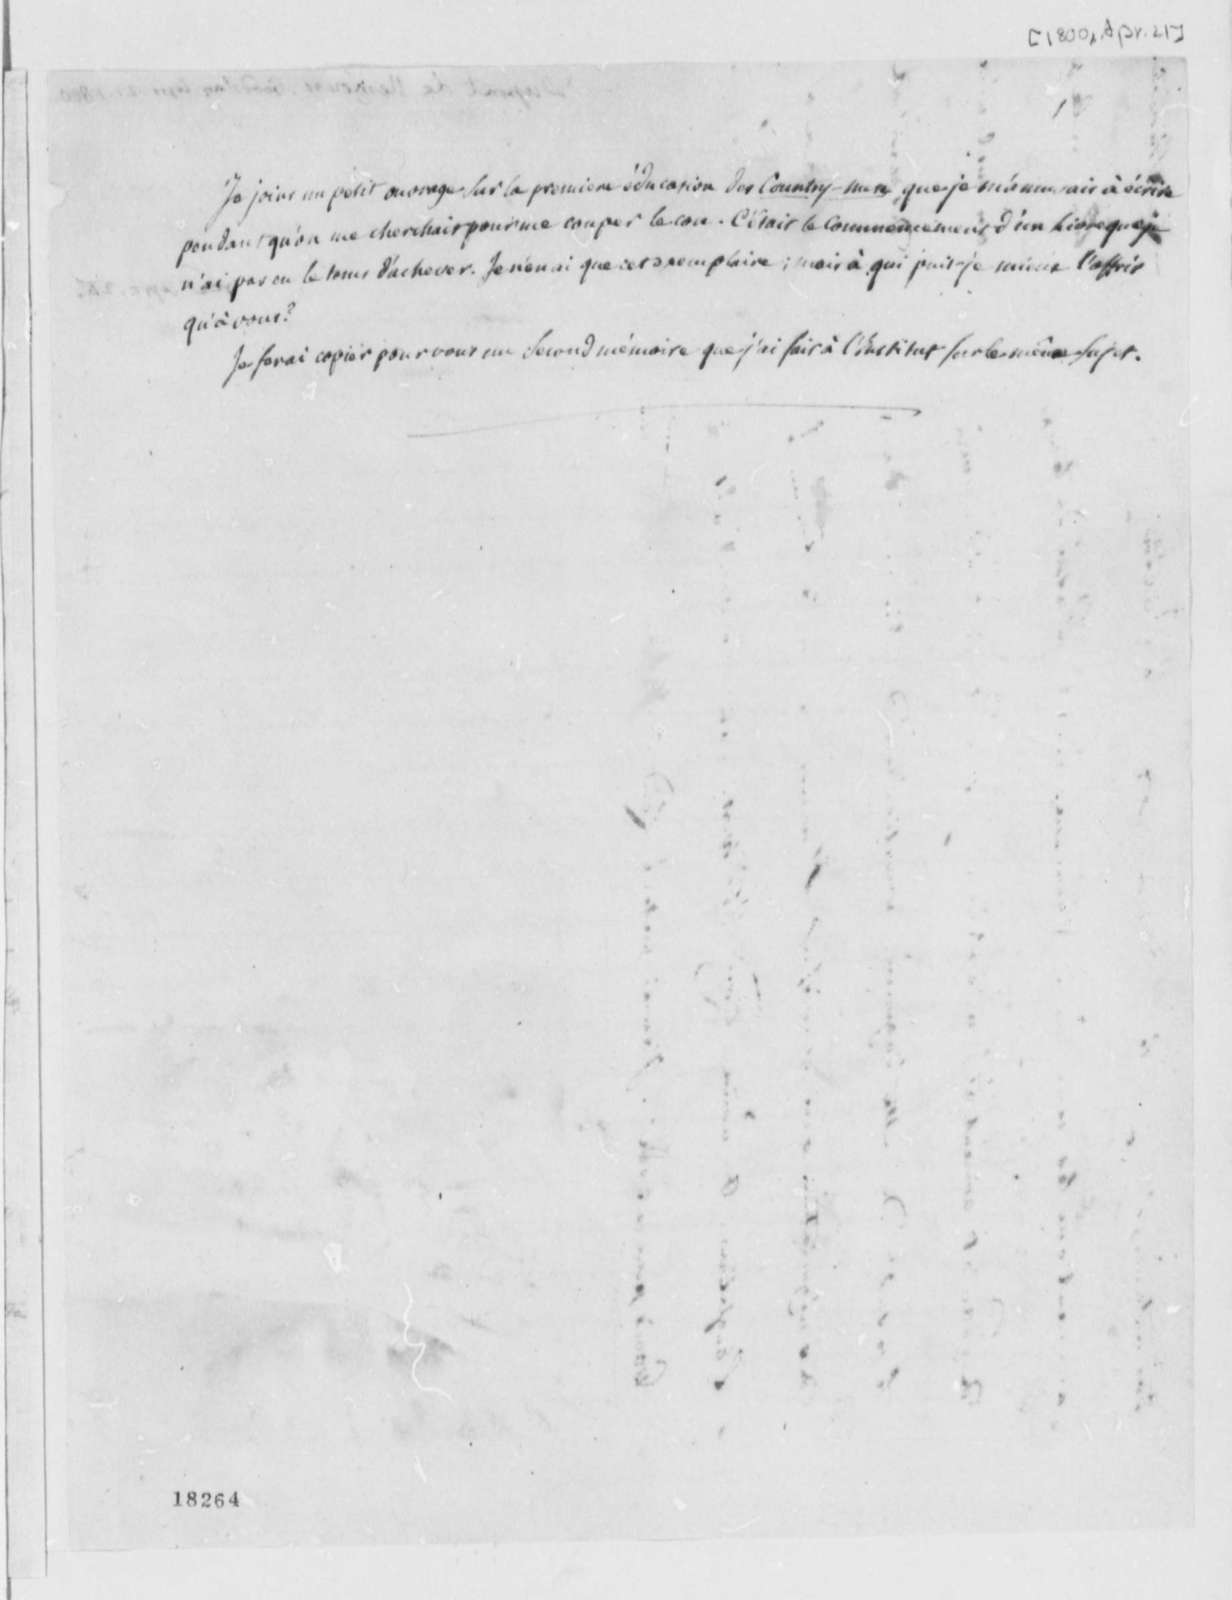 Pierre Samuel Dupont de Nemours to Thomas Jefferson, April 21, 1800, in French